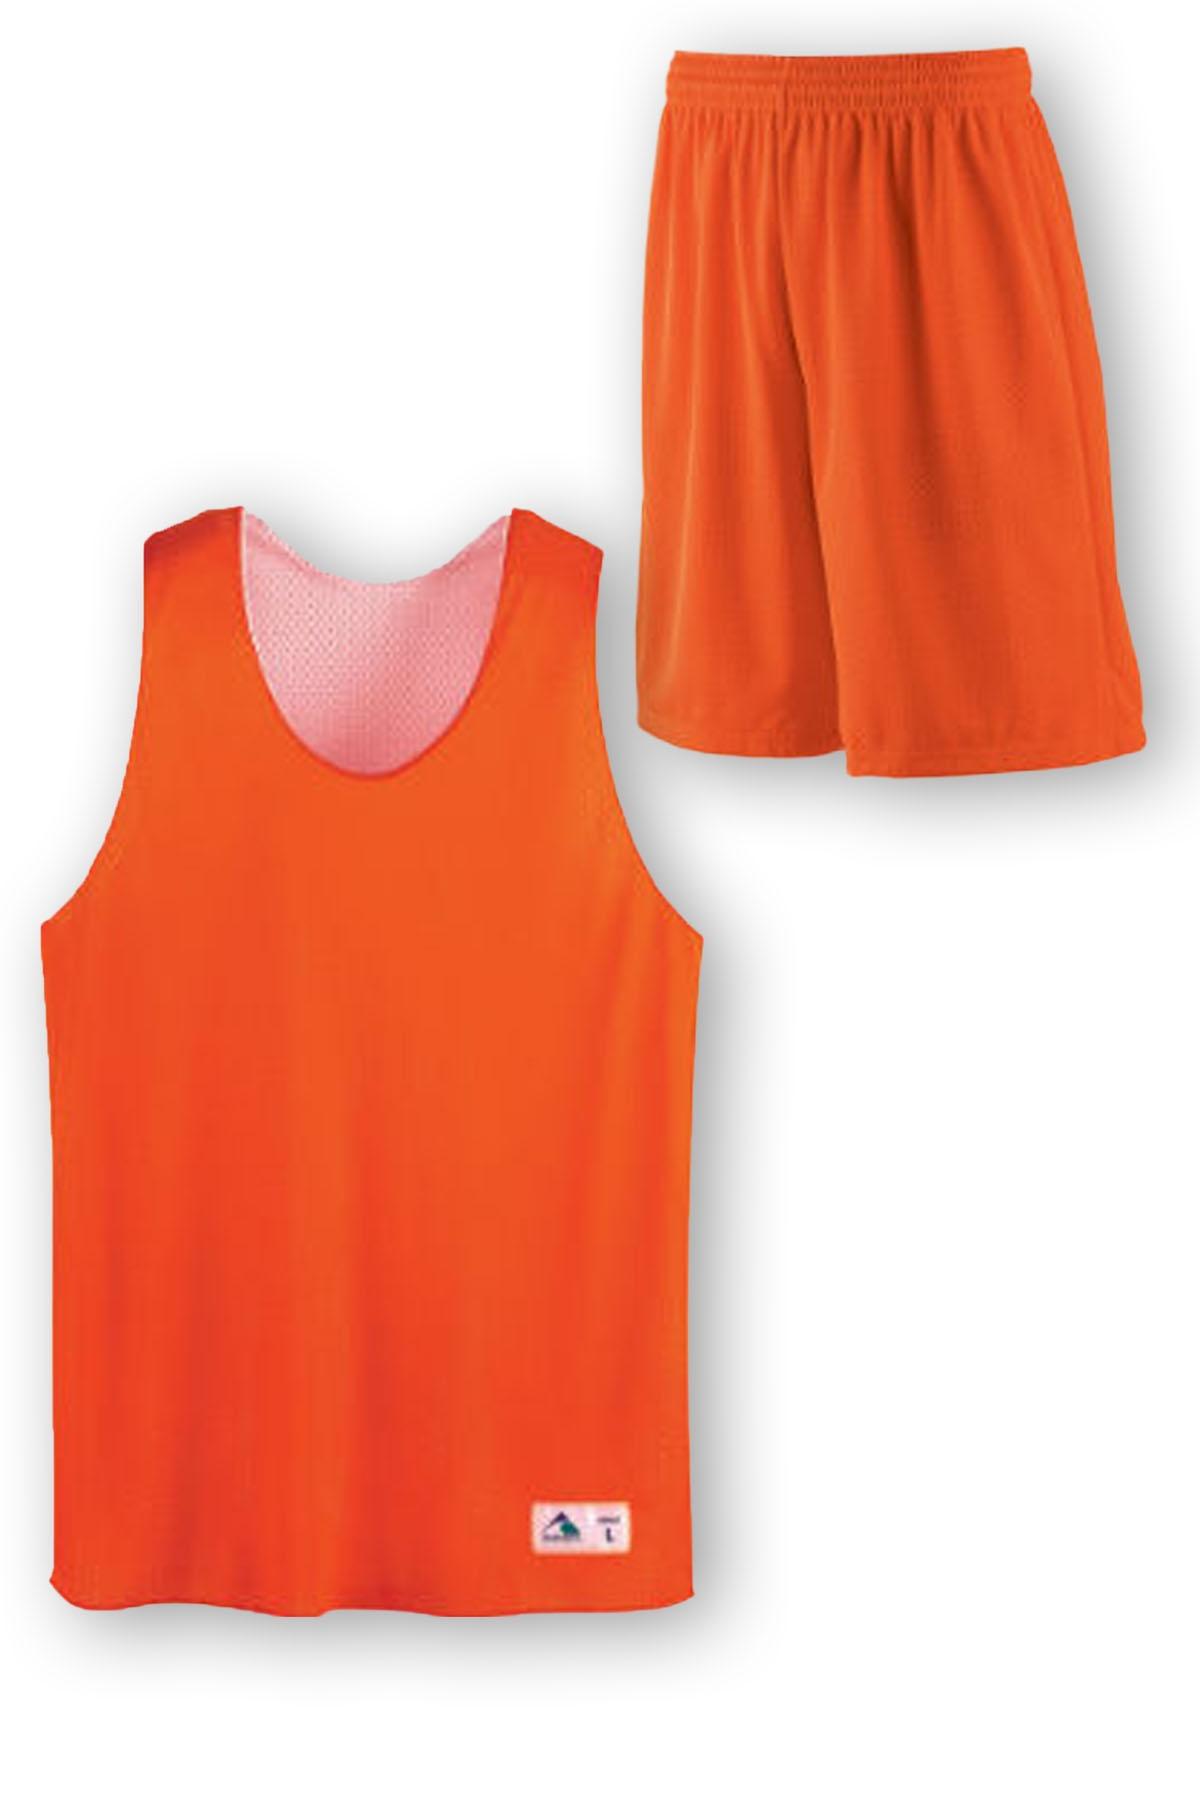 af579e7495e Augusta Sportswear Youth Basketball Practice Uniform PKG